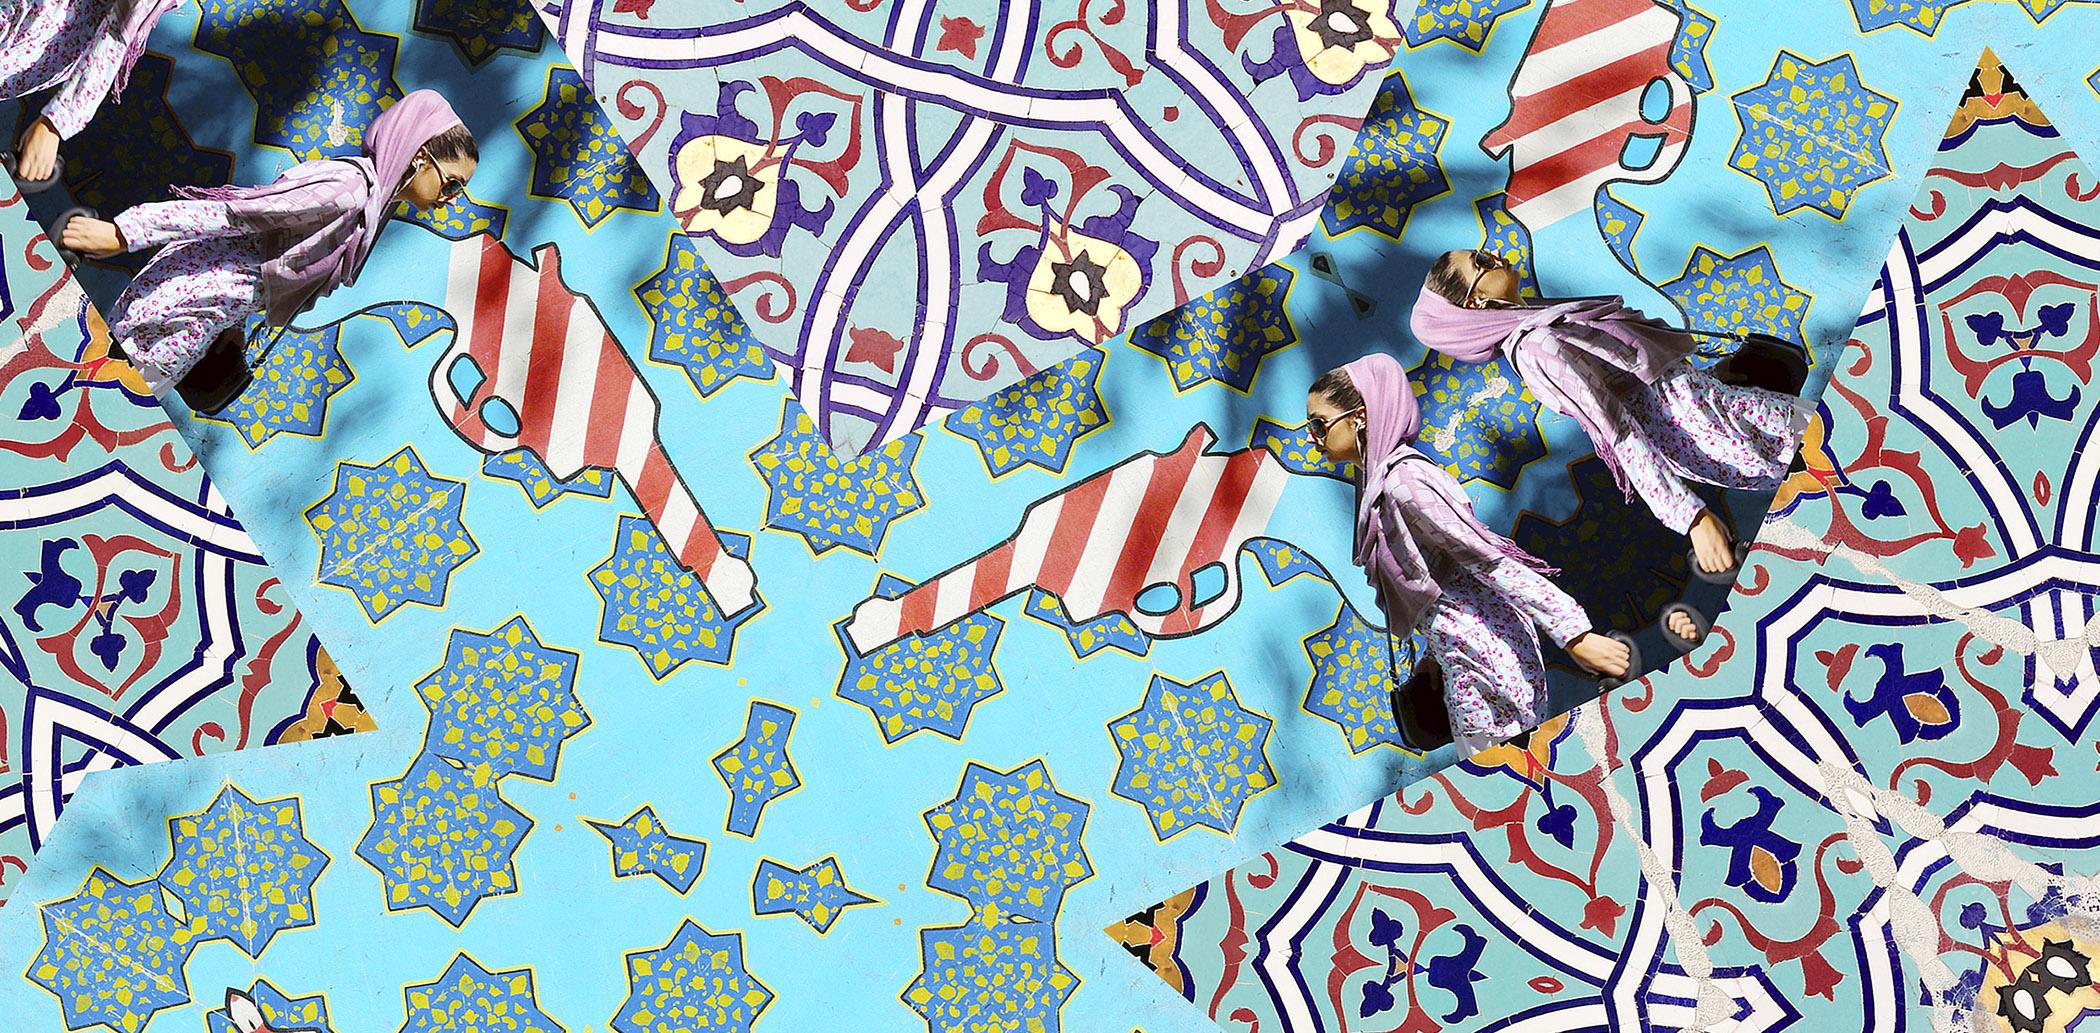 Sanaz_Mazinani_USAIRAN_Embasies_Detail.jpg